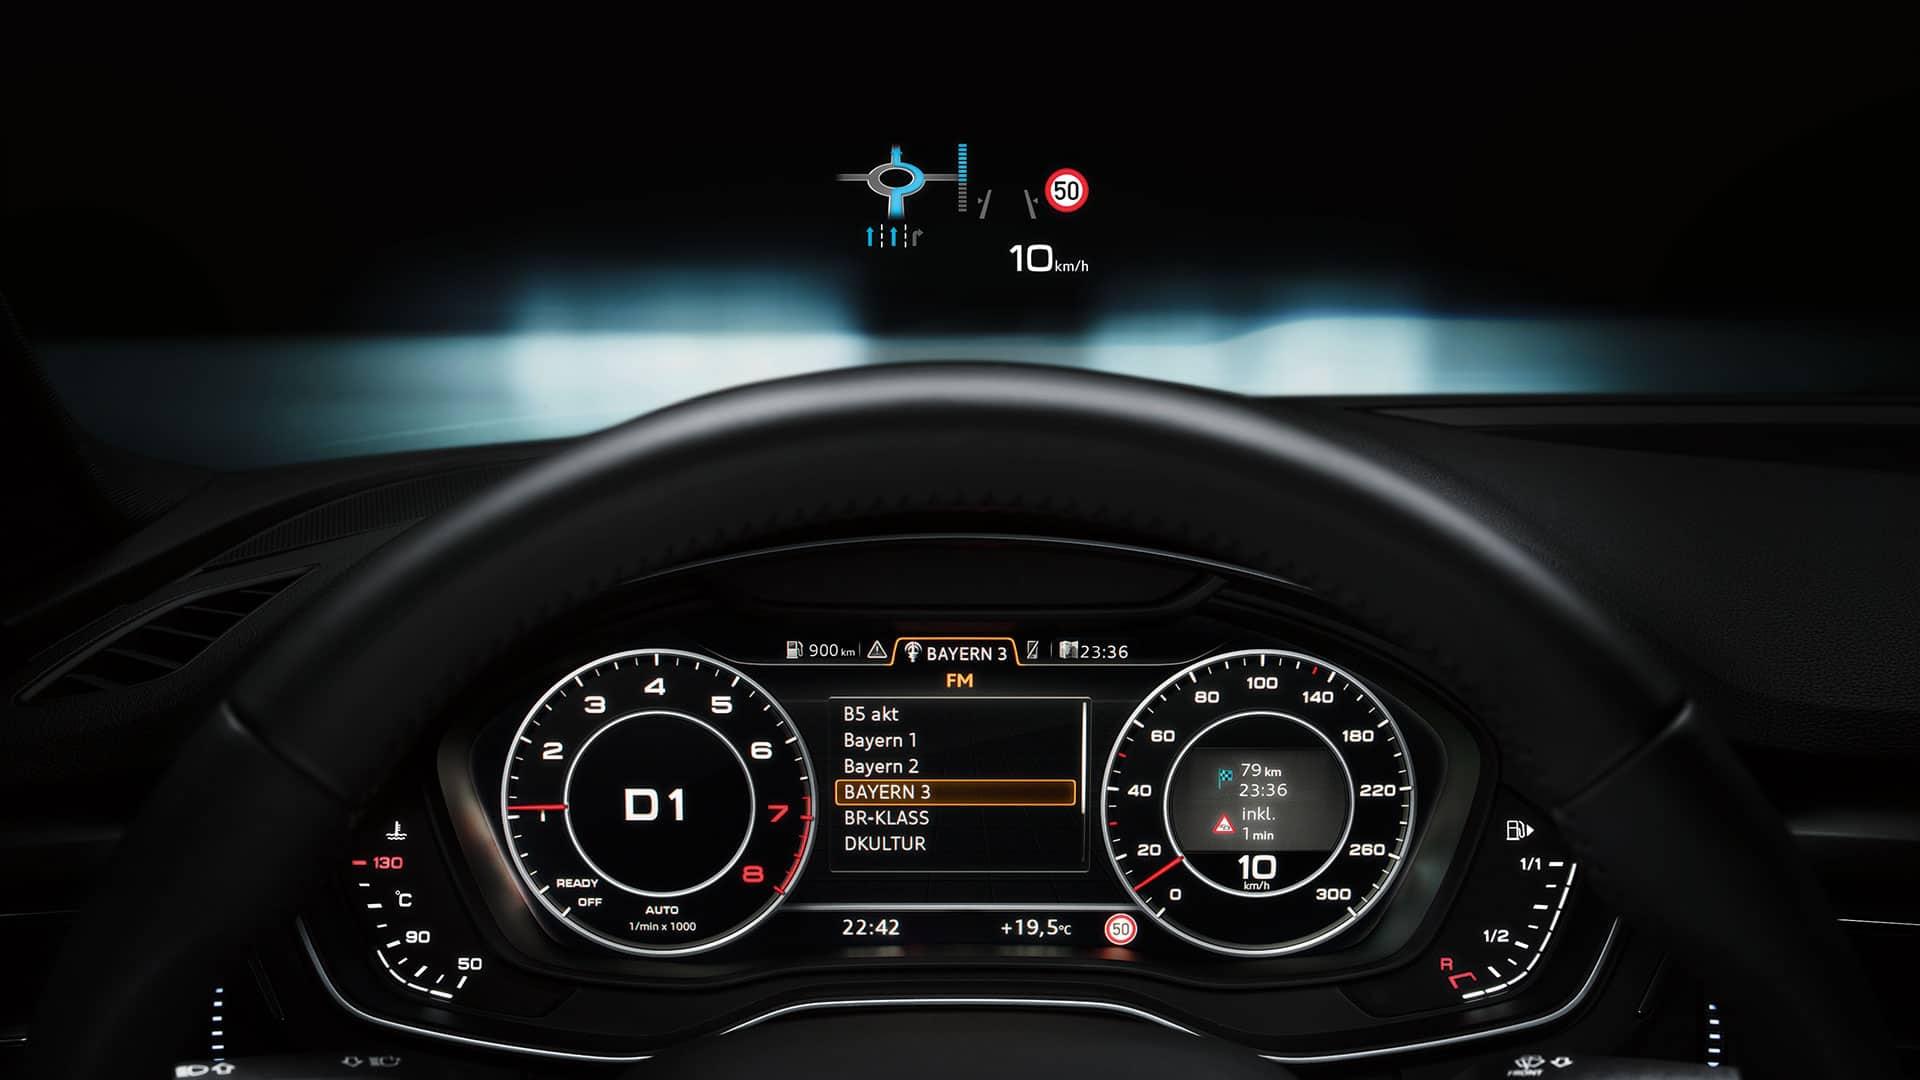 2018 A4 Sedan Audi Canada 1 8 Engine Diagram The